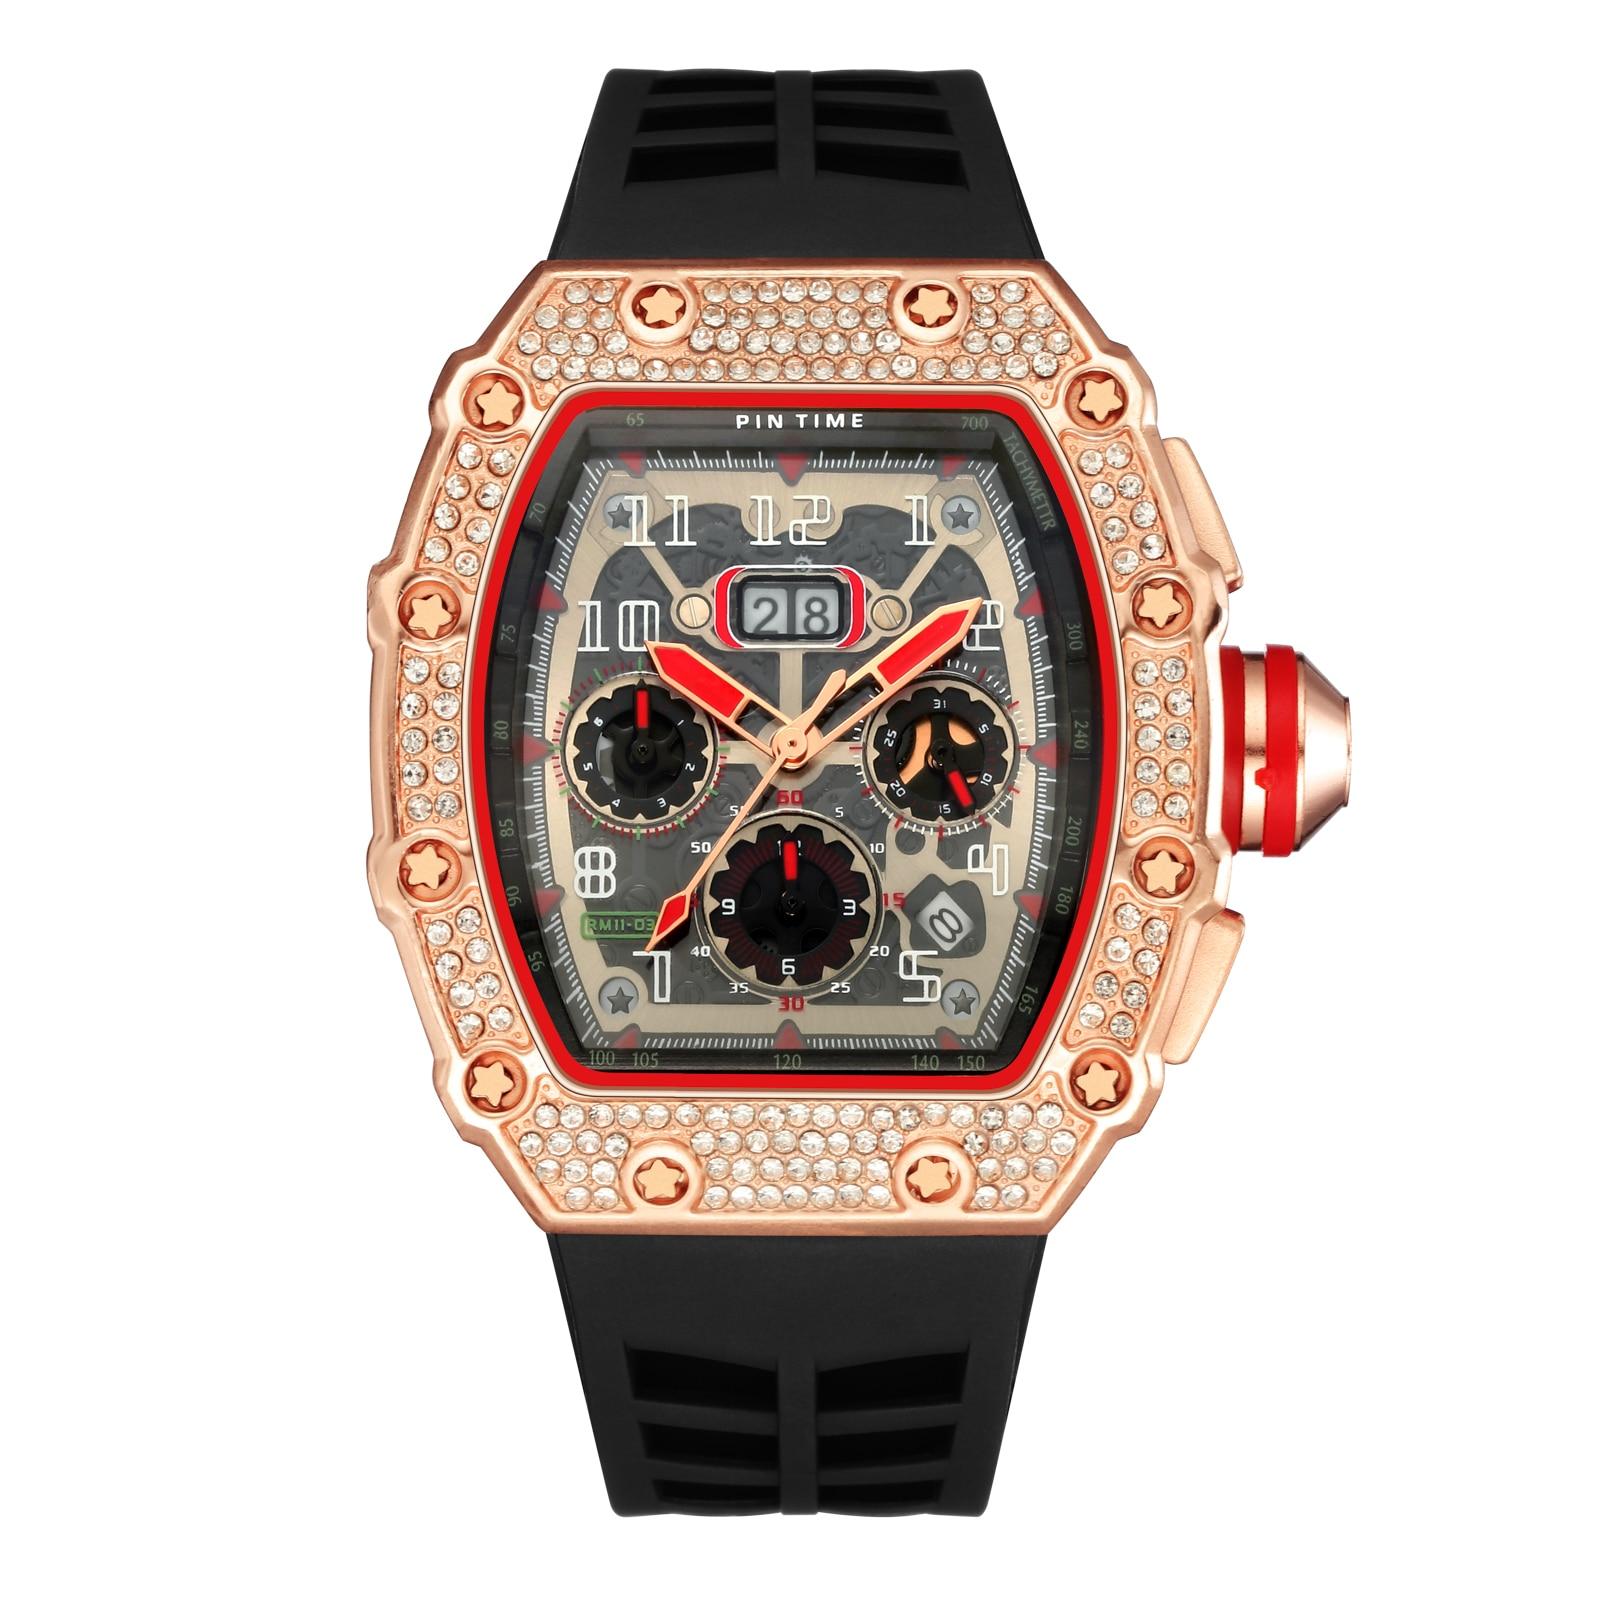 New Diamond Men's Watch Tonneau Gold Watches Men's Big Dial Quartz Watch Male Watches Square Watch Multifunctional Miller Clock